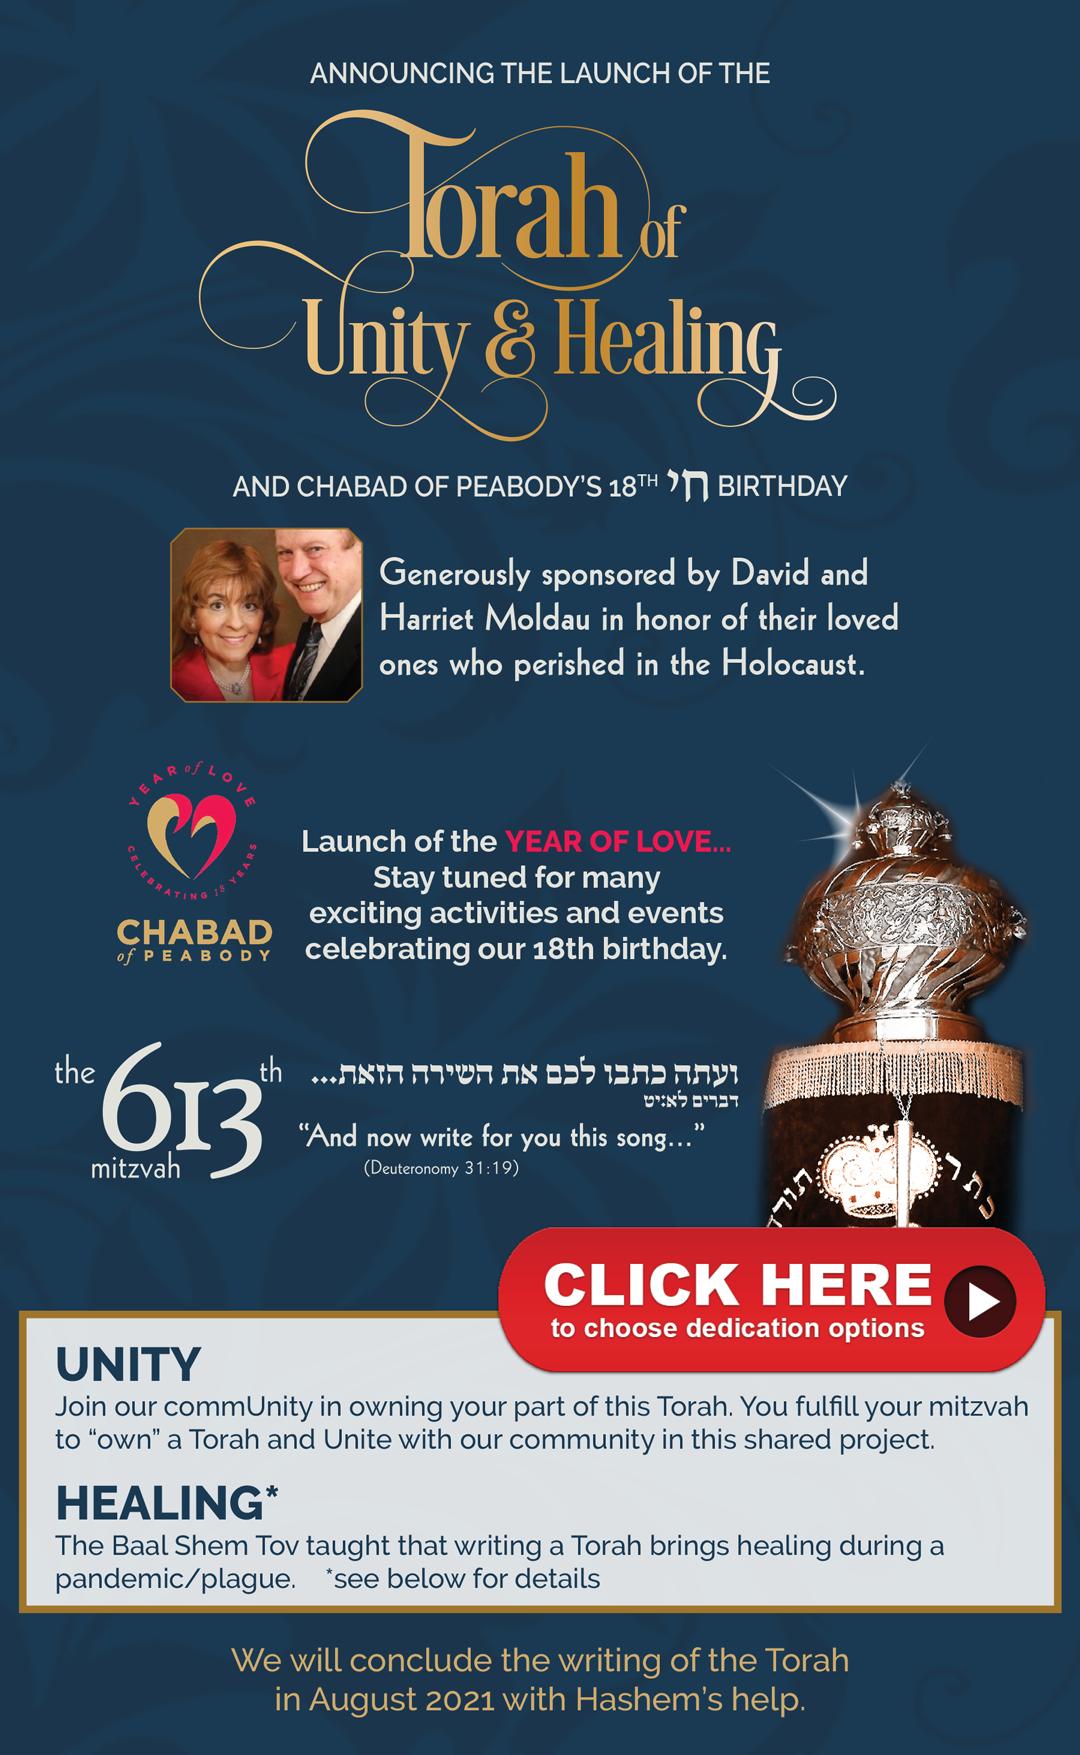 Unity-Healing-Torah-2020_Header.jpg